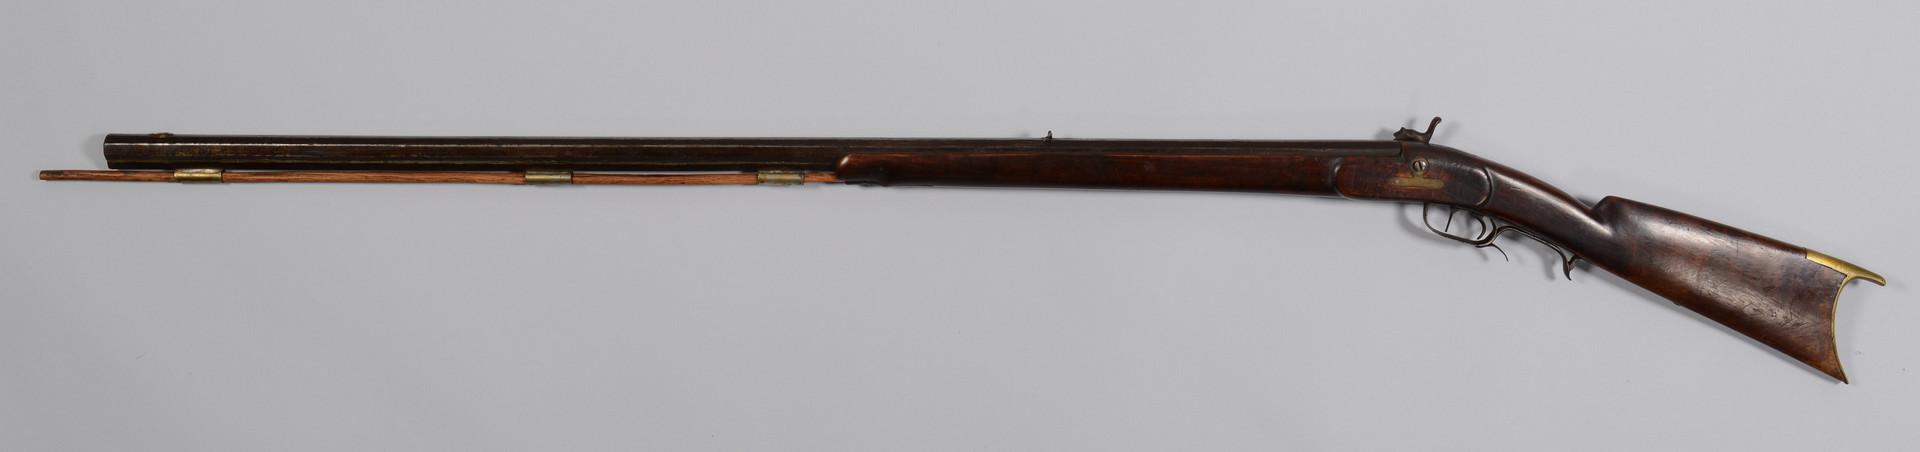 Lot 716: 2 Percussion Half Stock Rifles